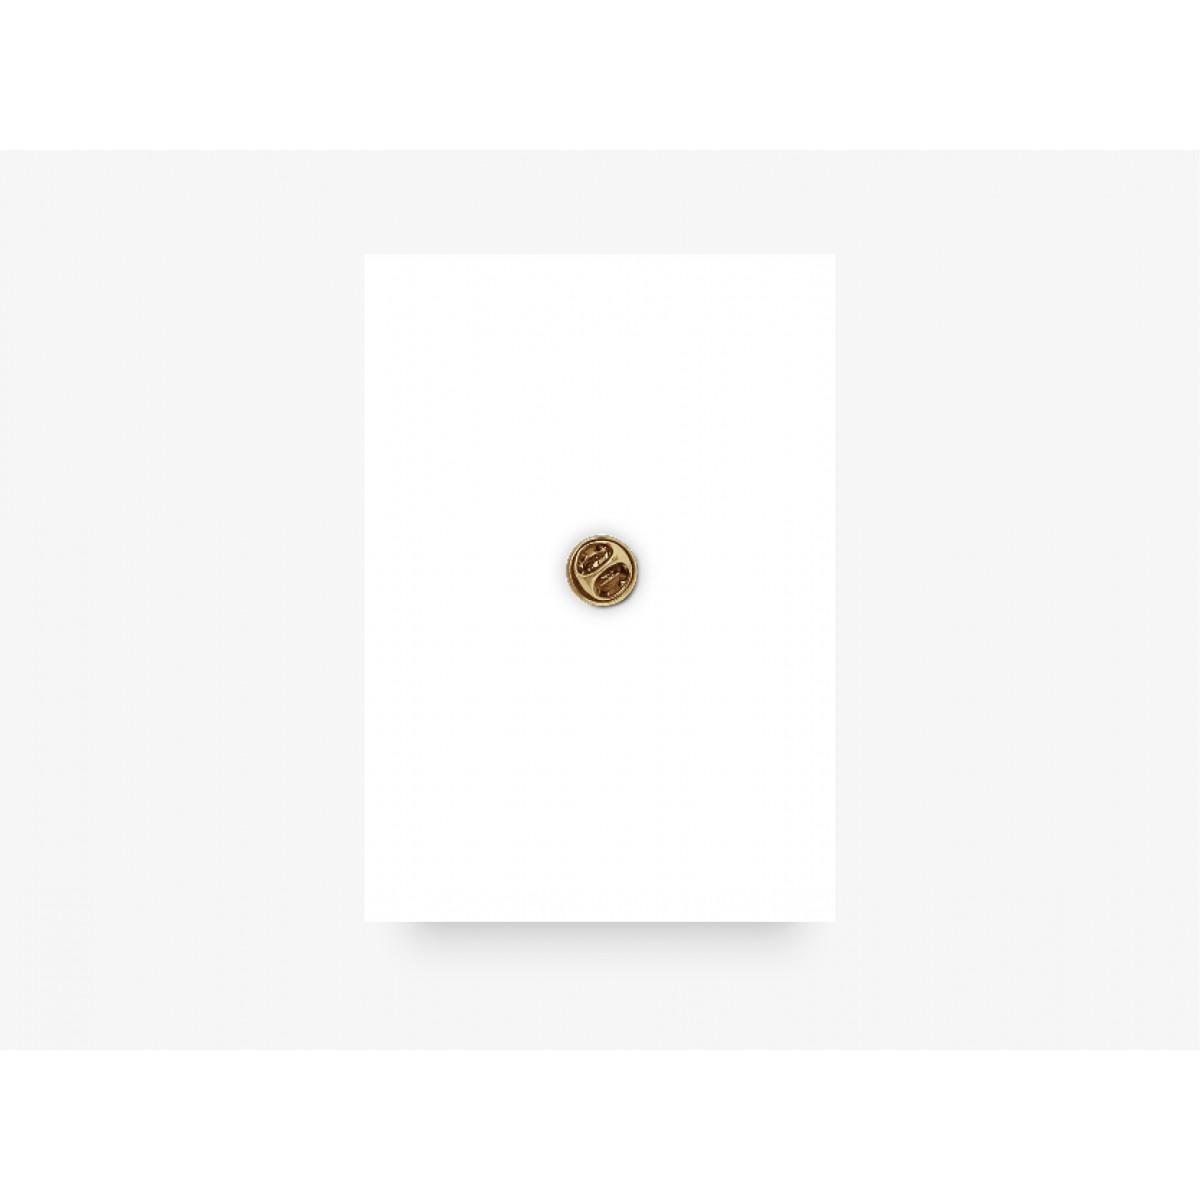 typealive / Pin / Wiener